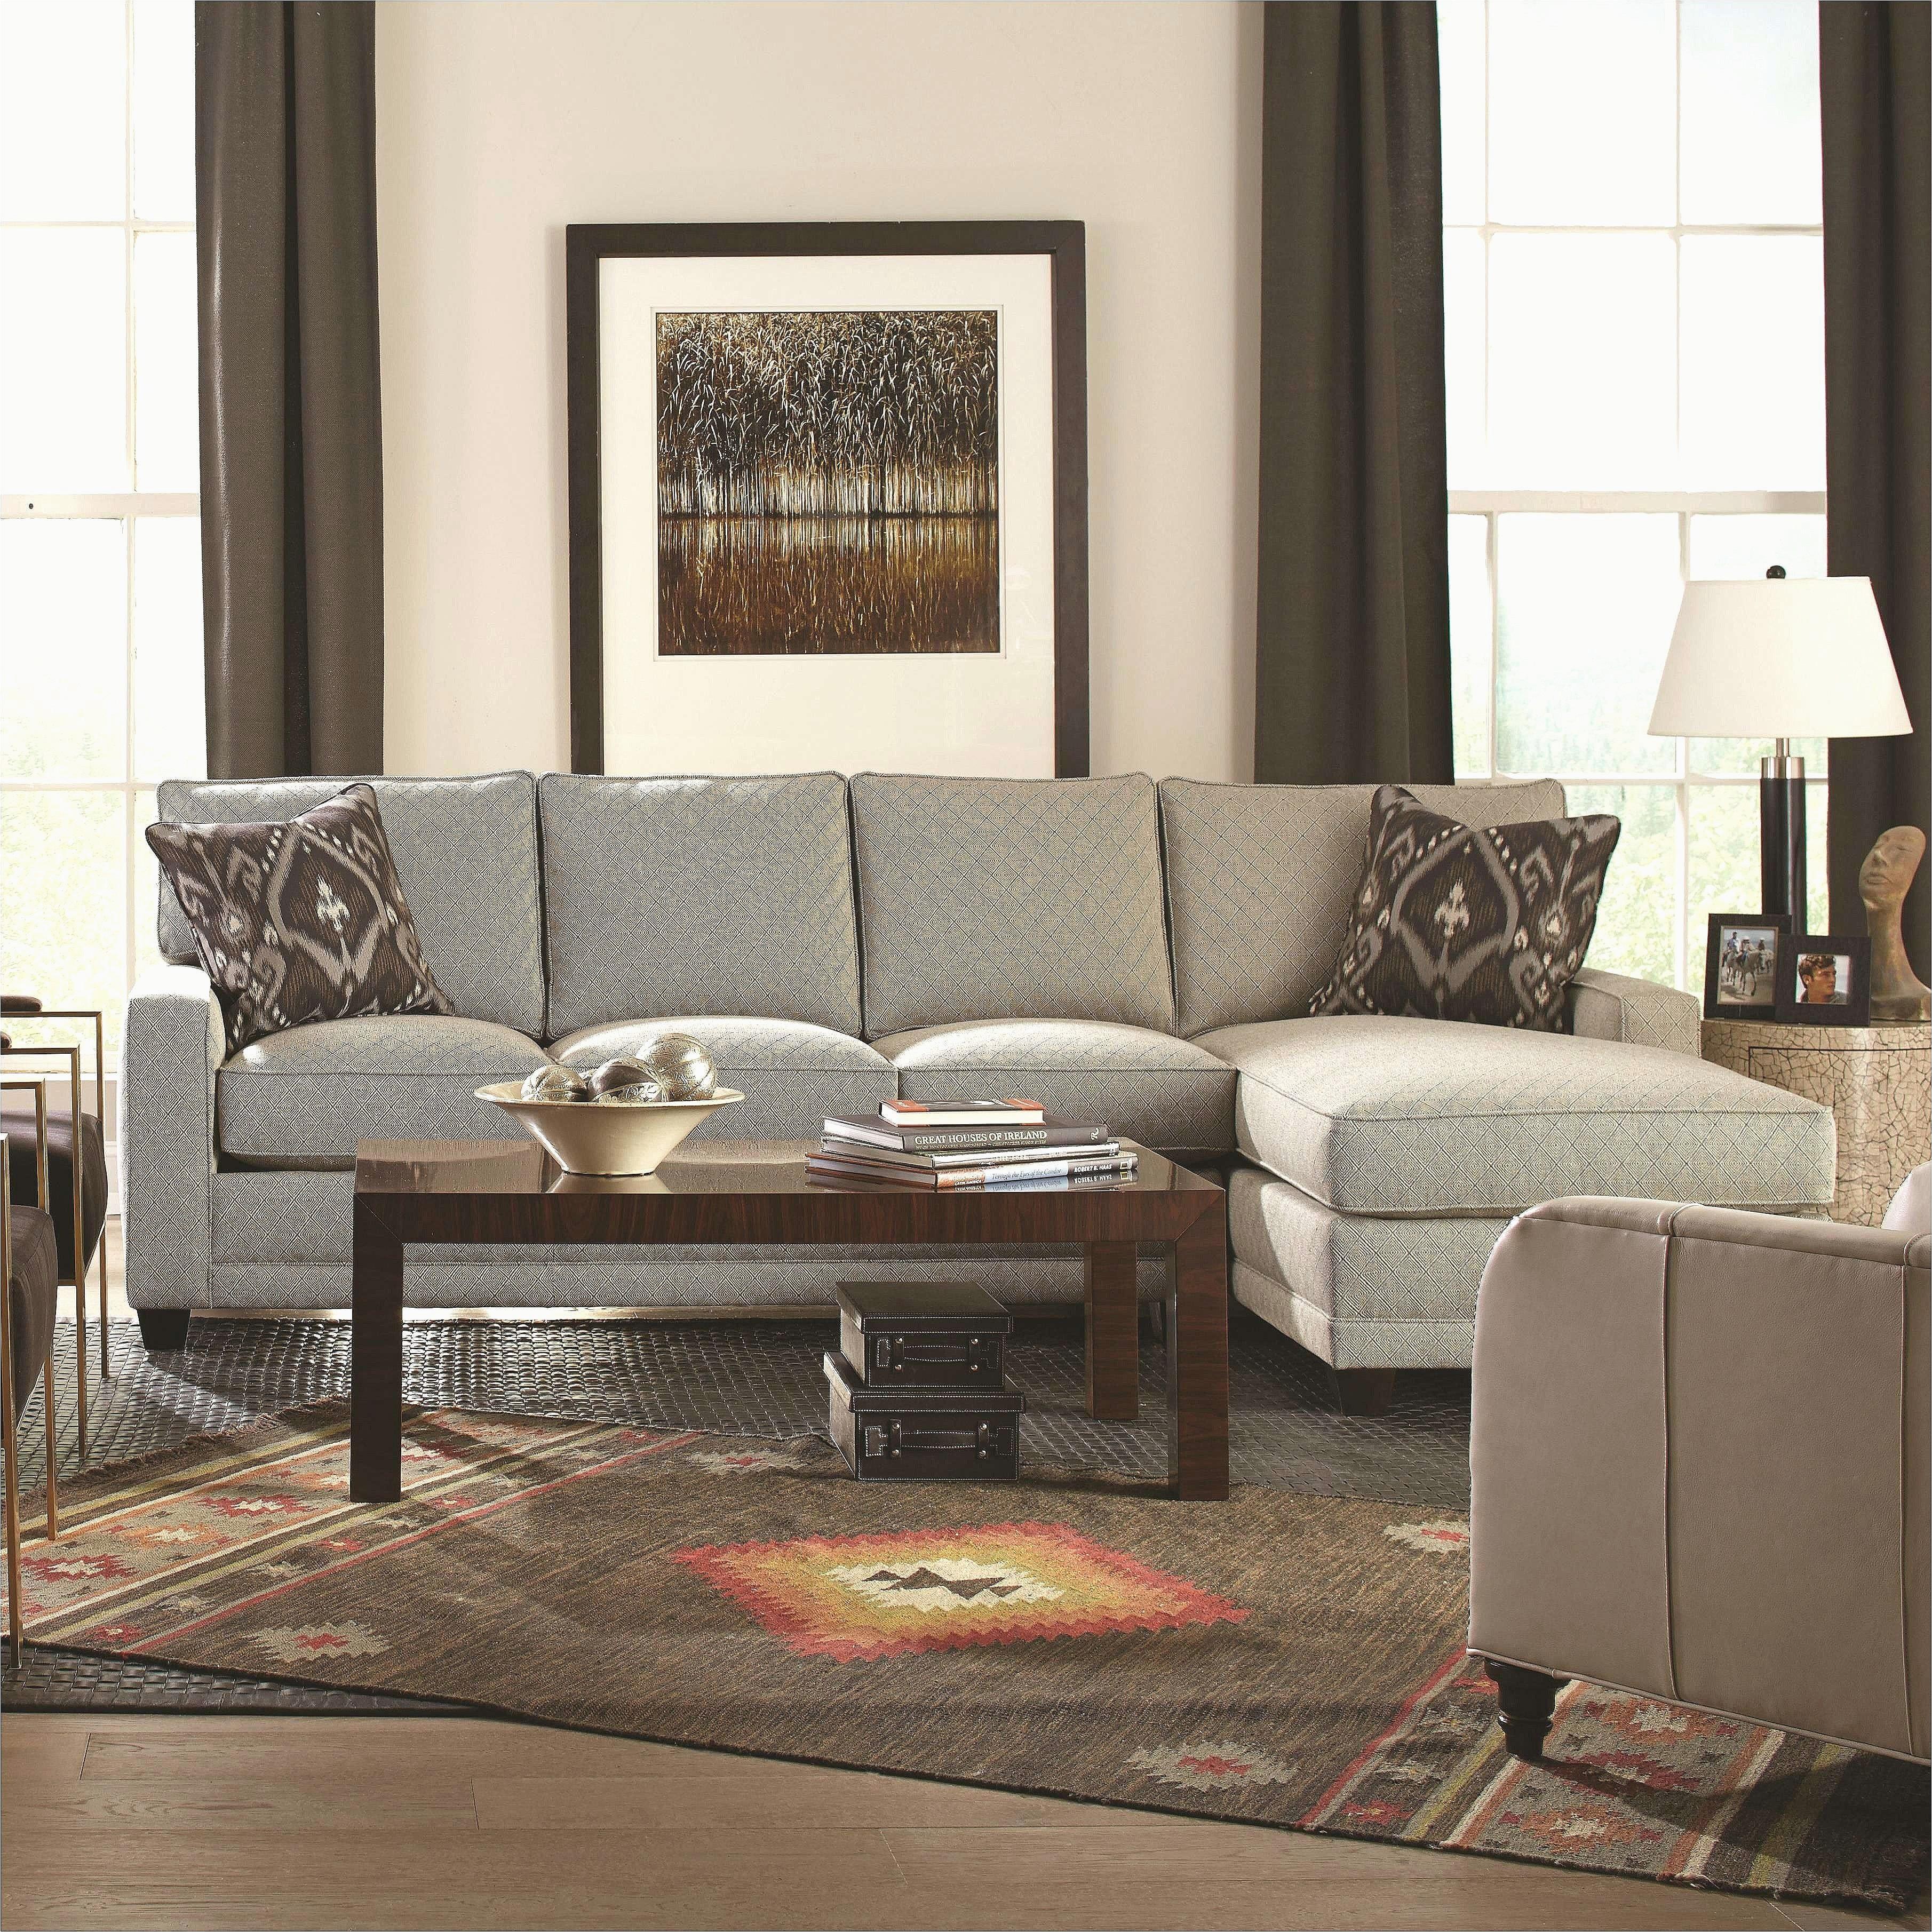 modern bedroom decor inspirational modern living room furniture new gunstige sofa macys furniture 0d